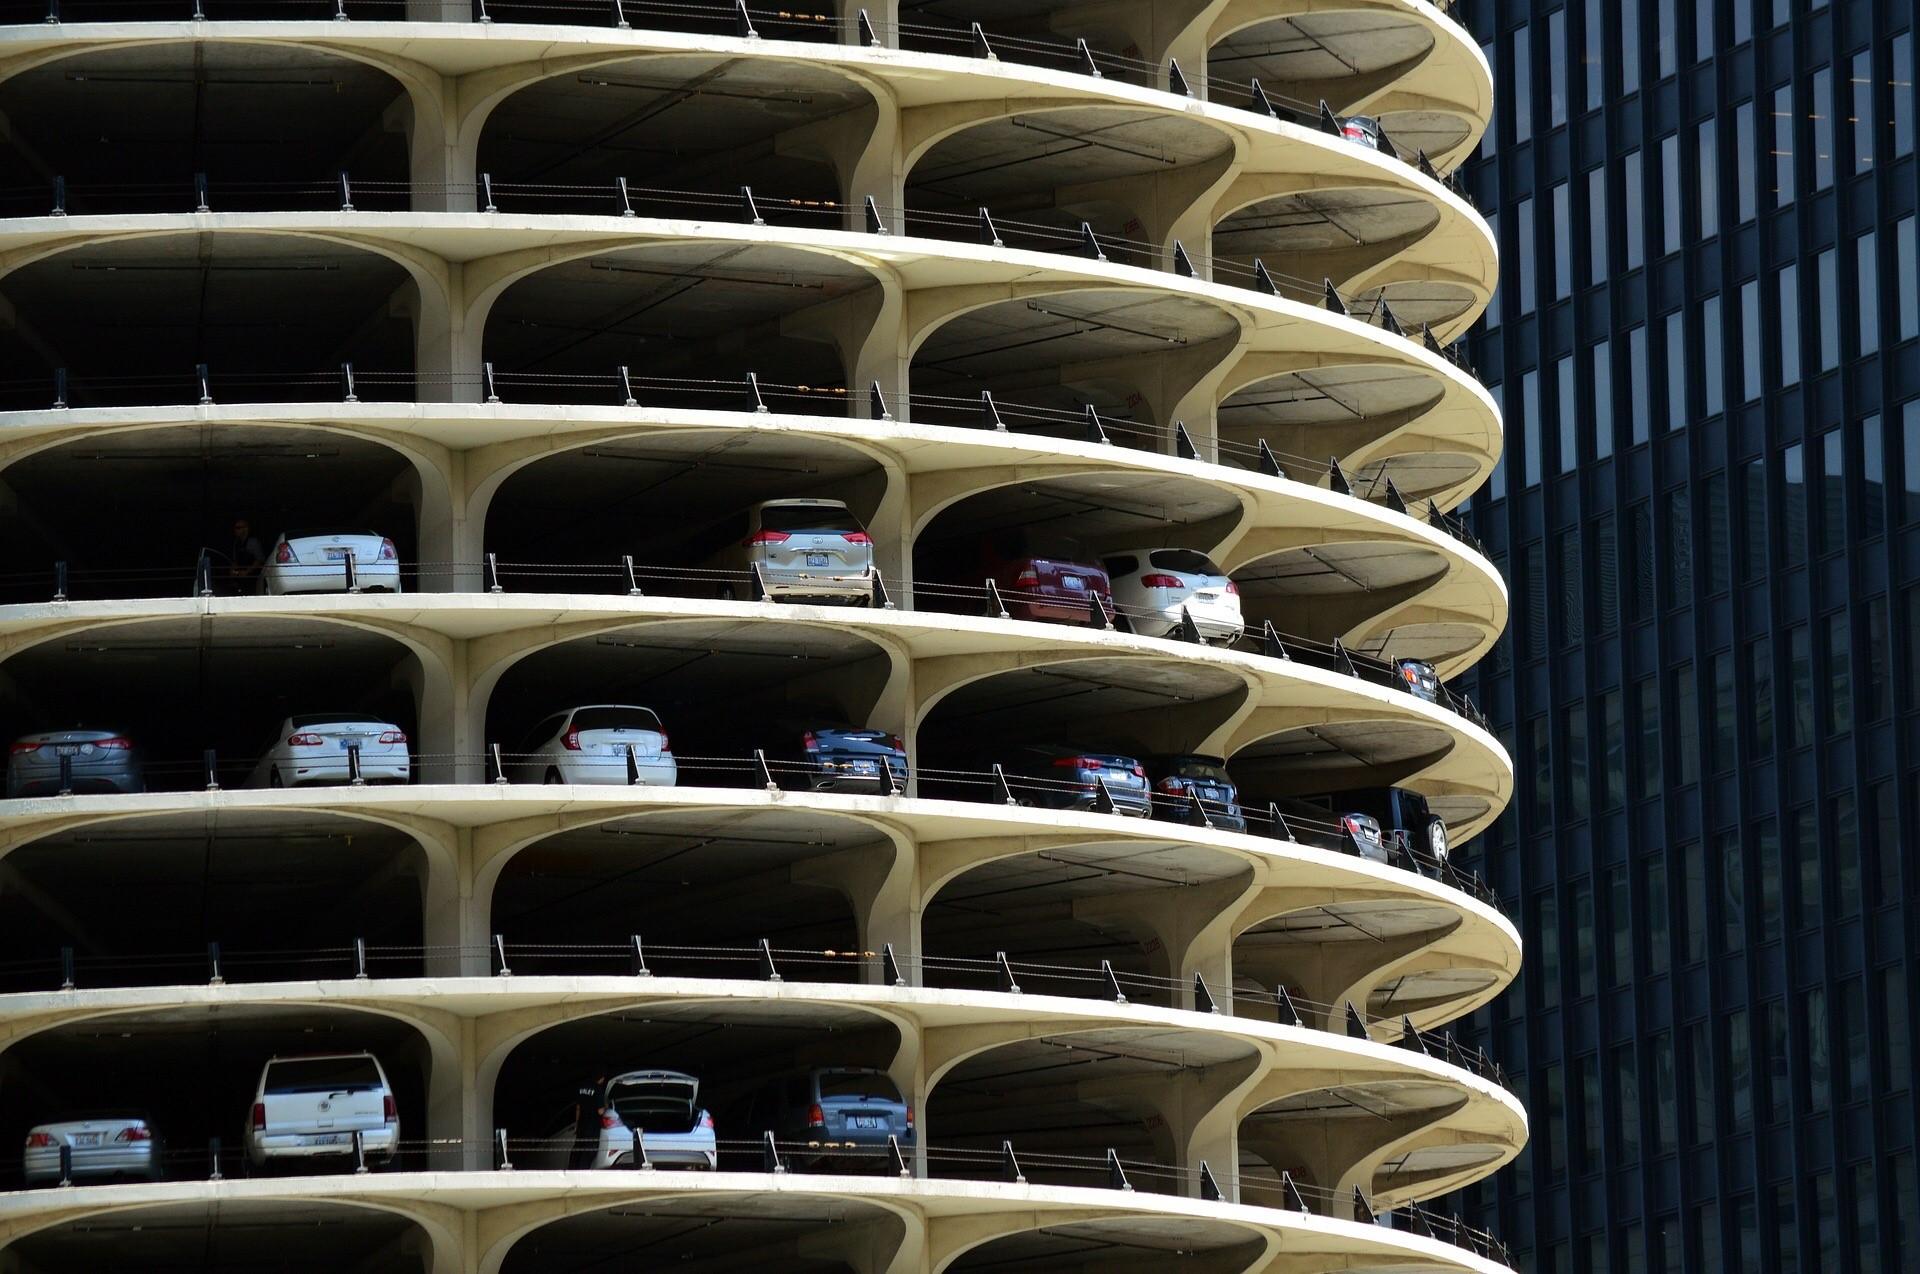 Off-Street Parking Telecom